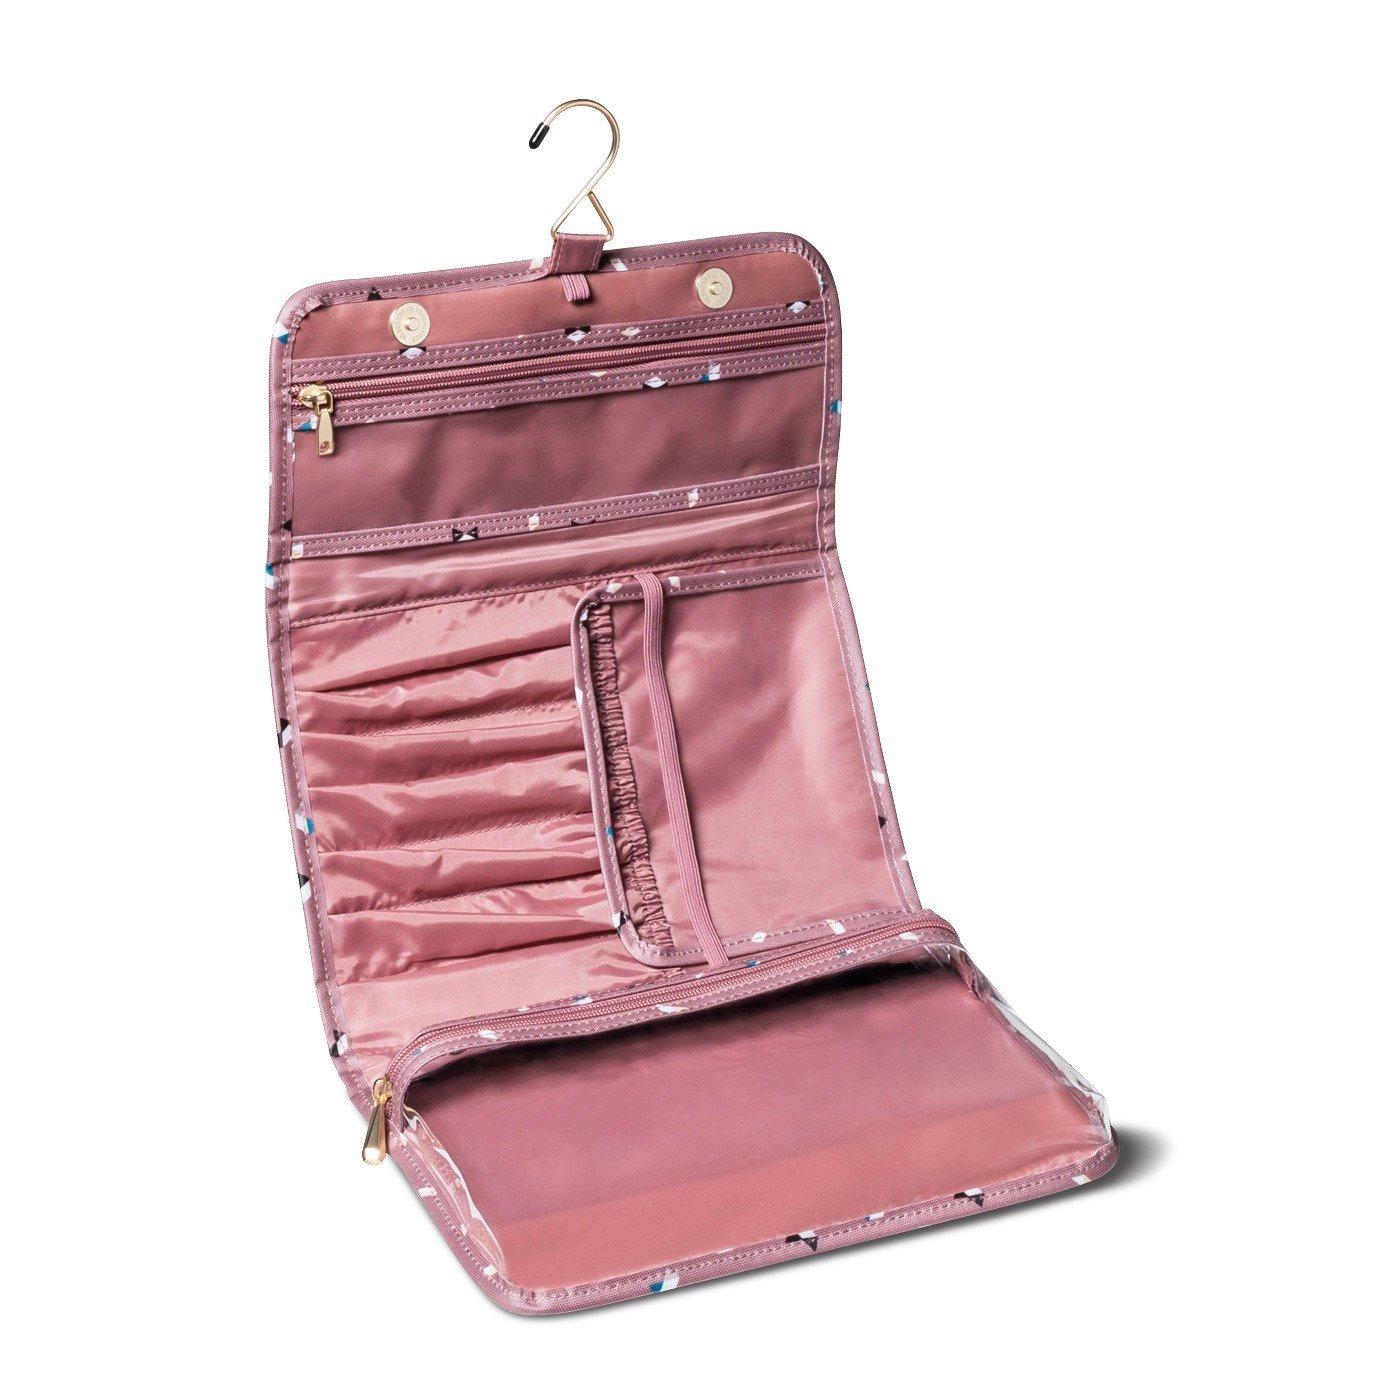 Sonia Kashuk153; Cosmetic Bag Hanging Organizer Valet Broken Houndstooth MULTI-COLORED